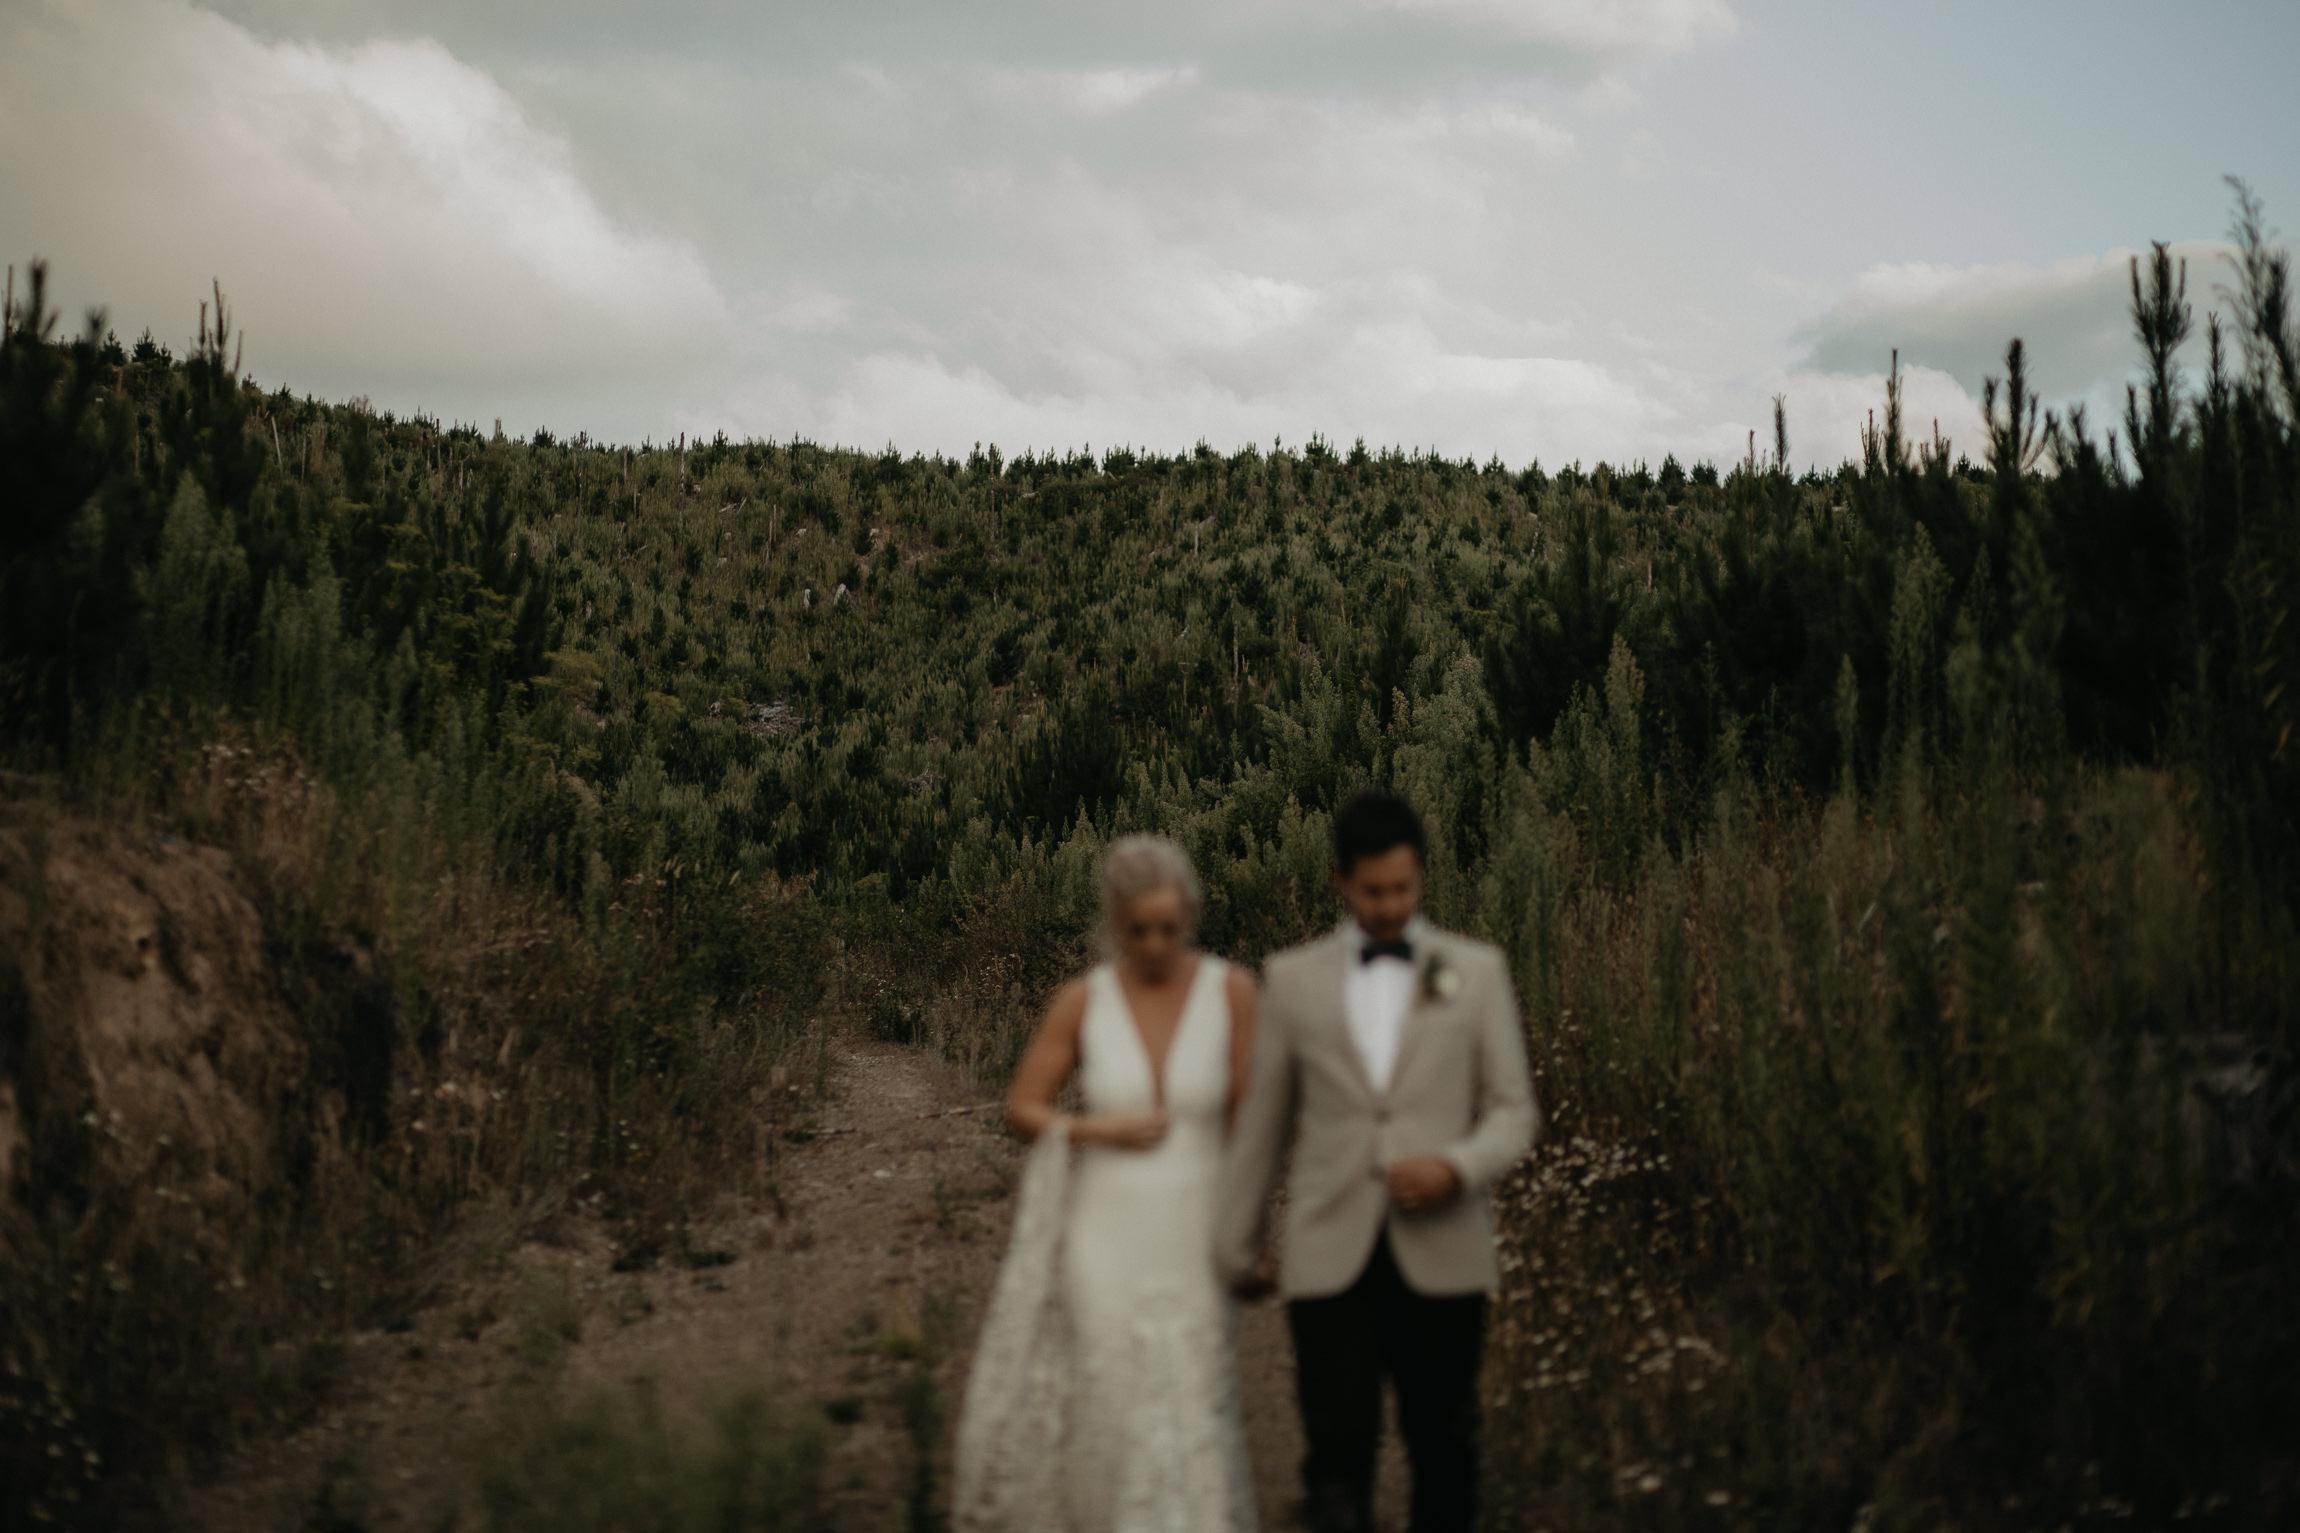 oldforestschool-wedding-blog-173.jpg